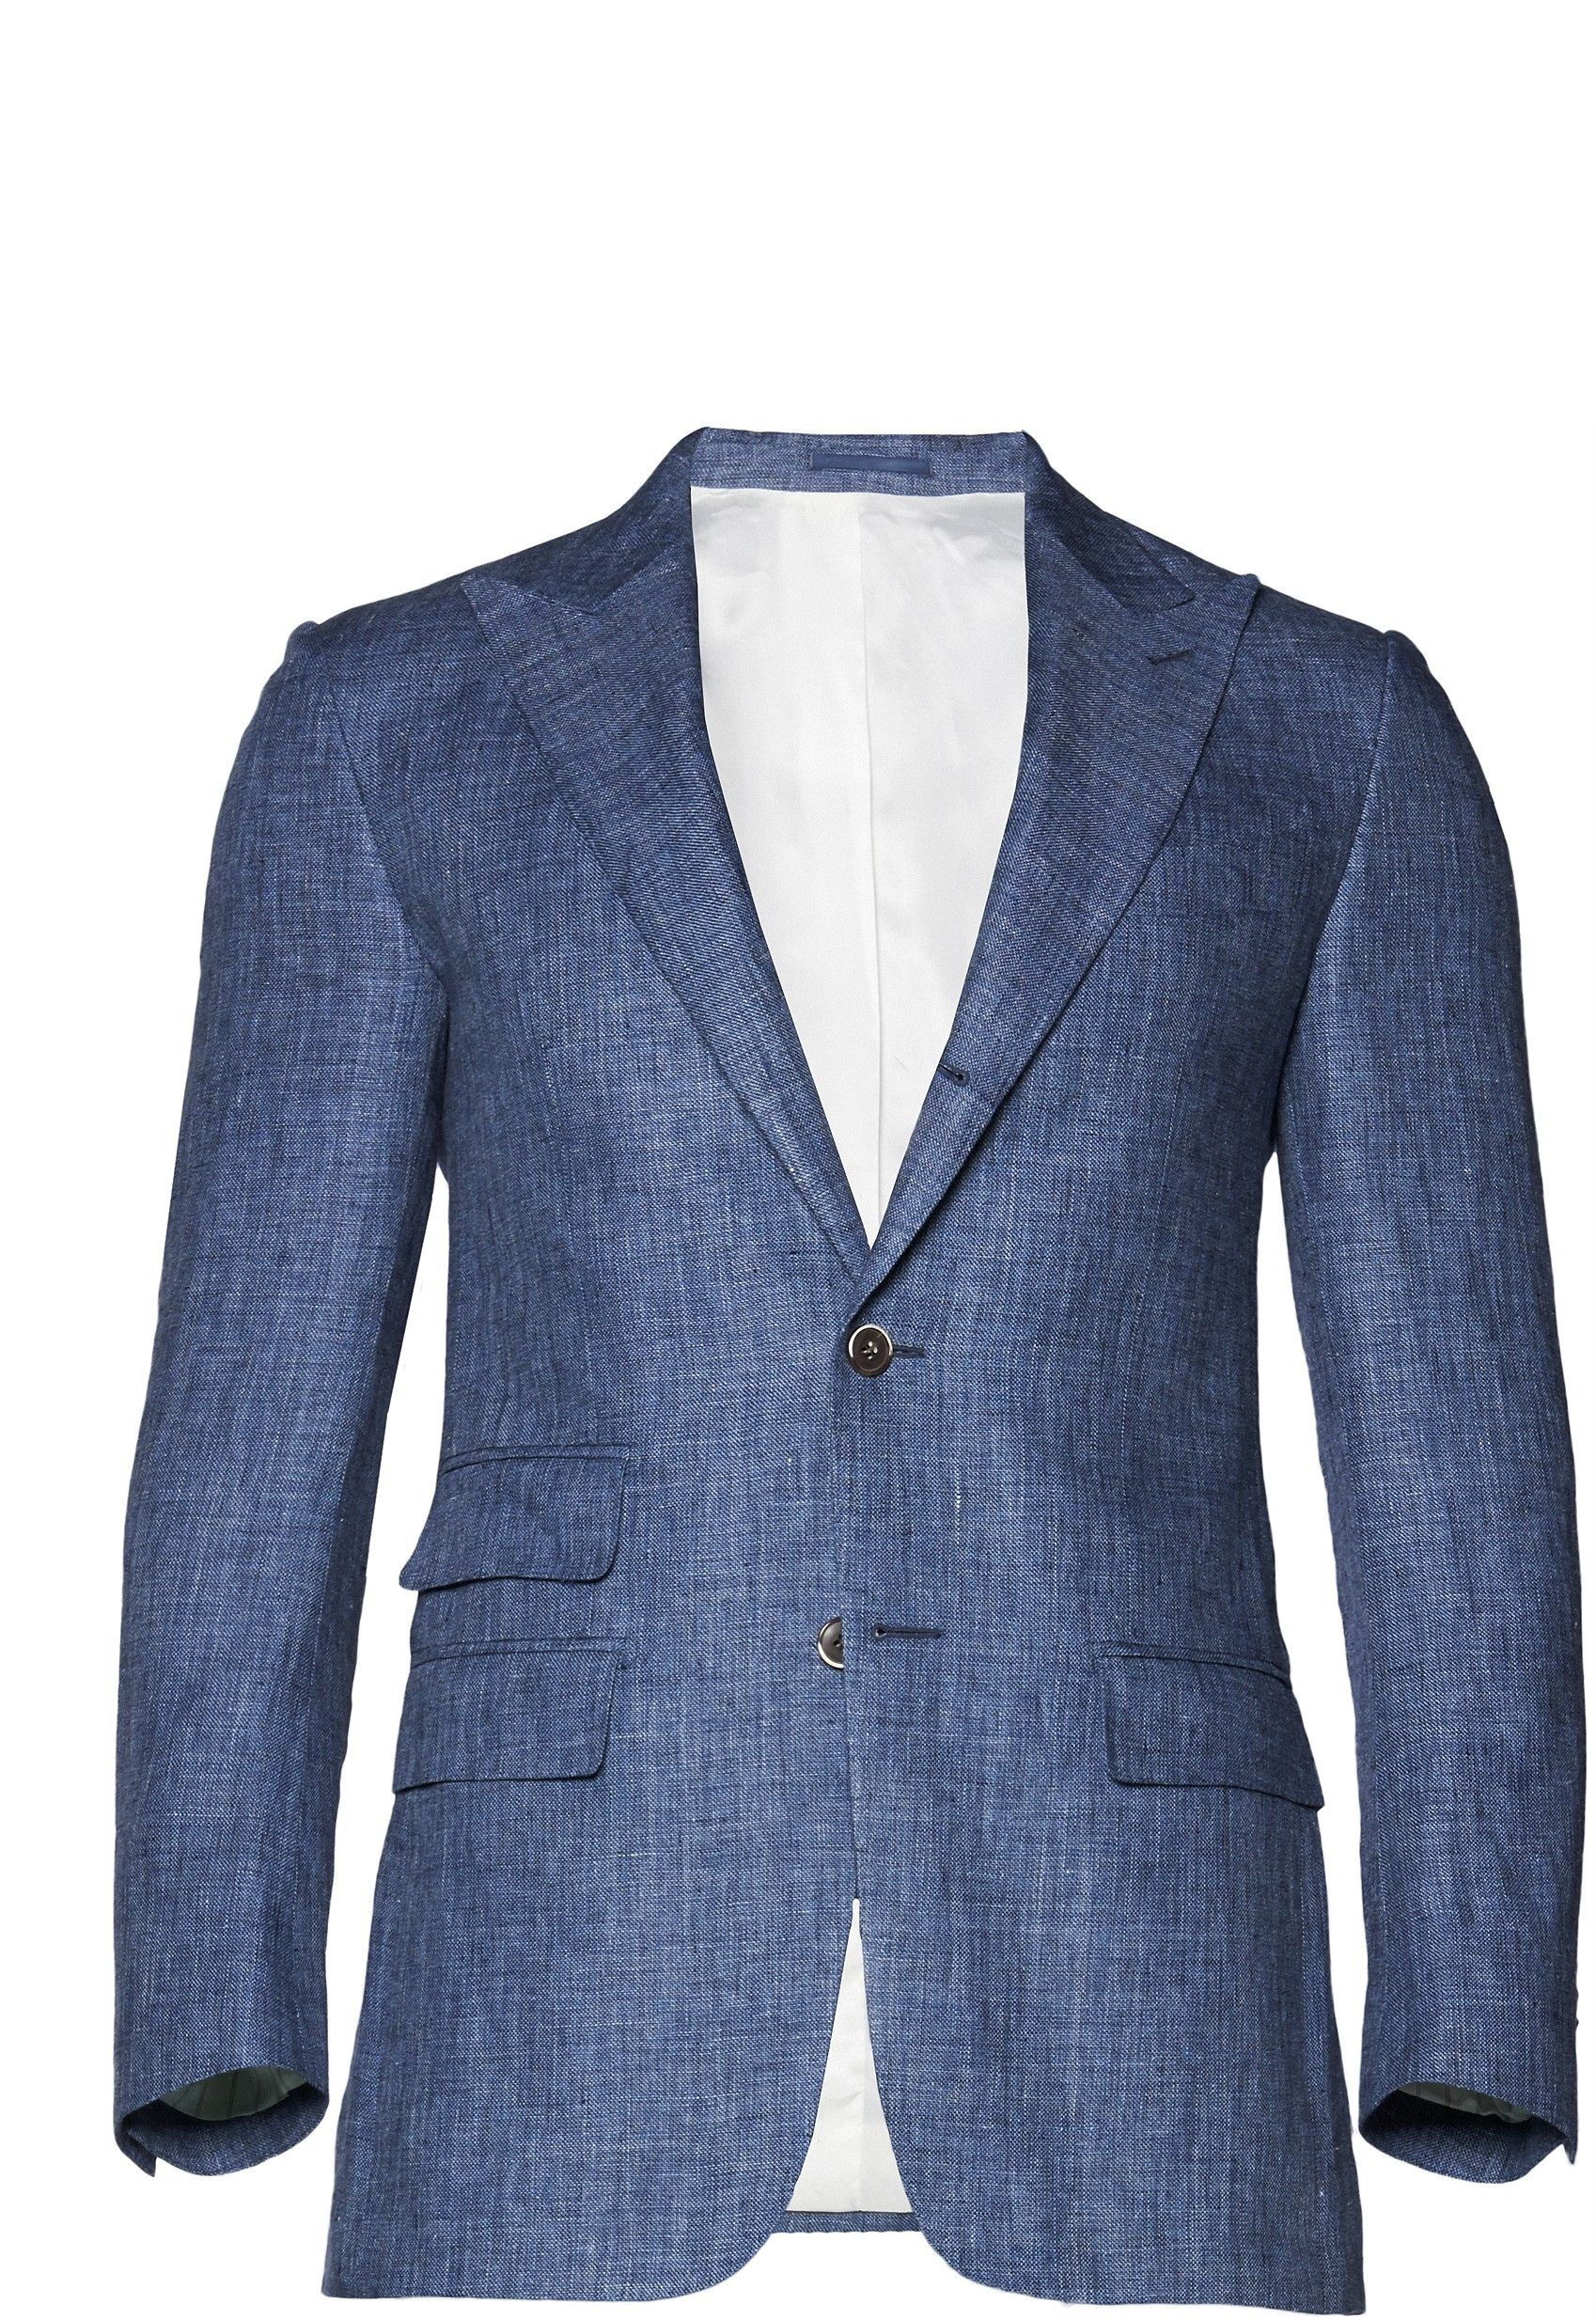 Blue linen jacket suit supply | Groom\'s attire | Pinterest | Linen ...